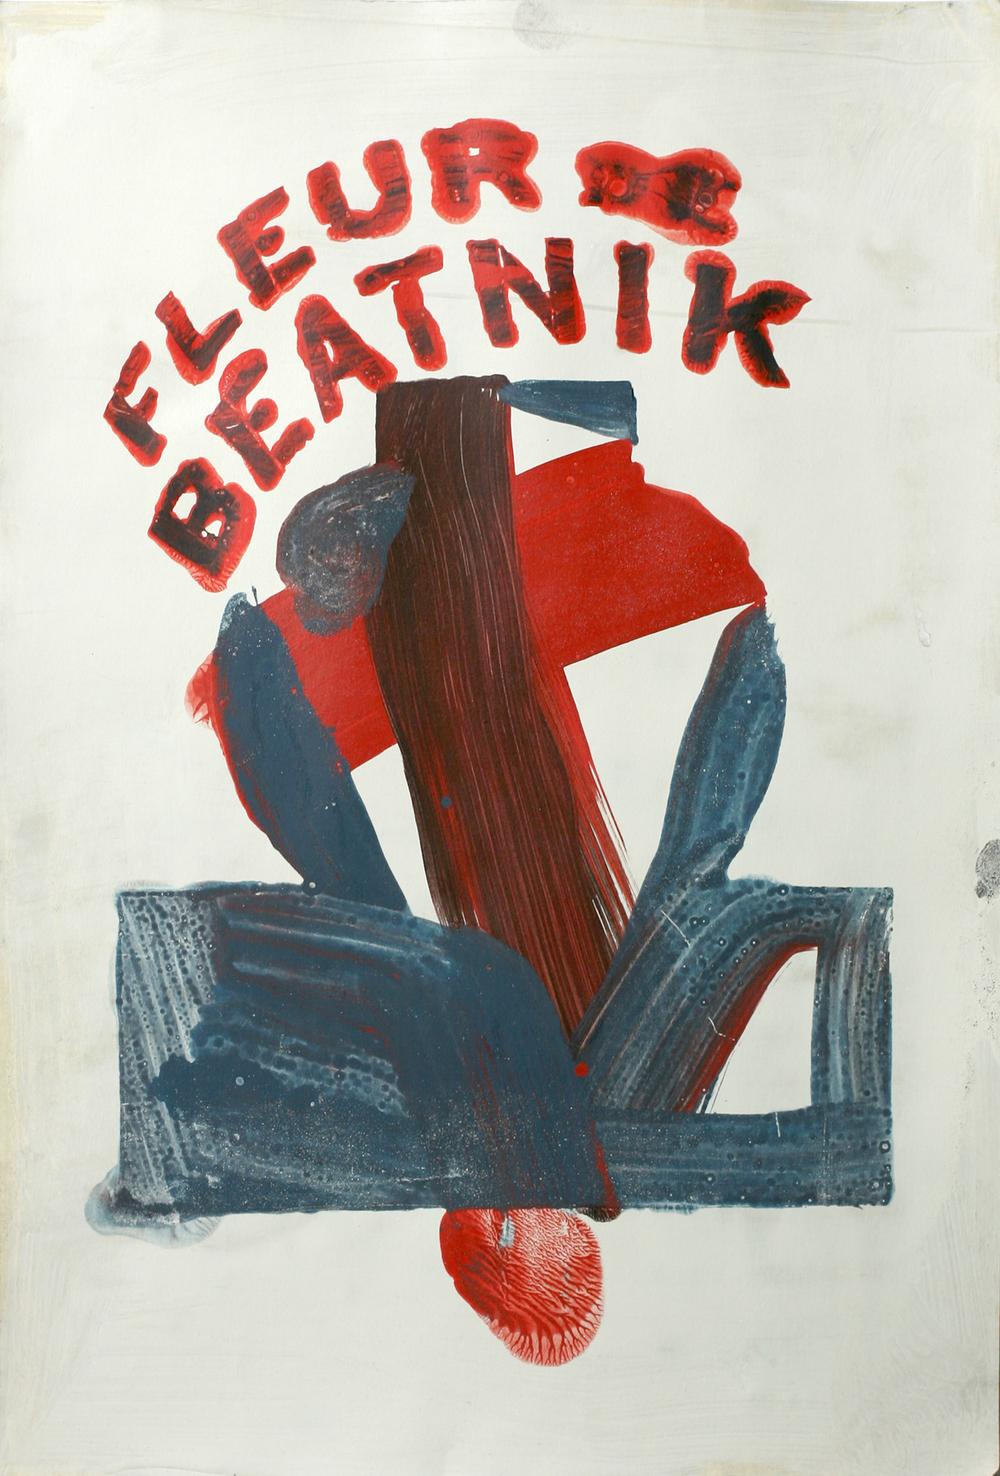 Fleur de Beatnik, title sheet